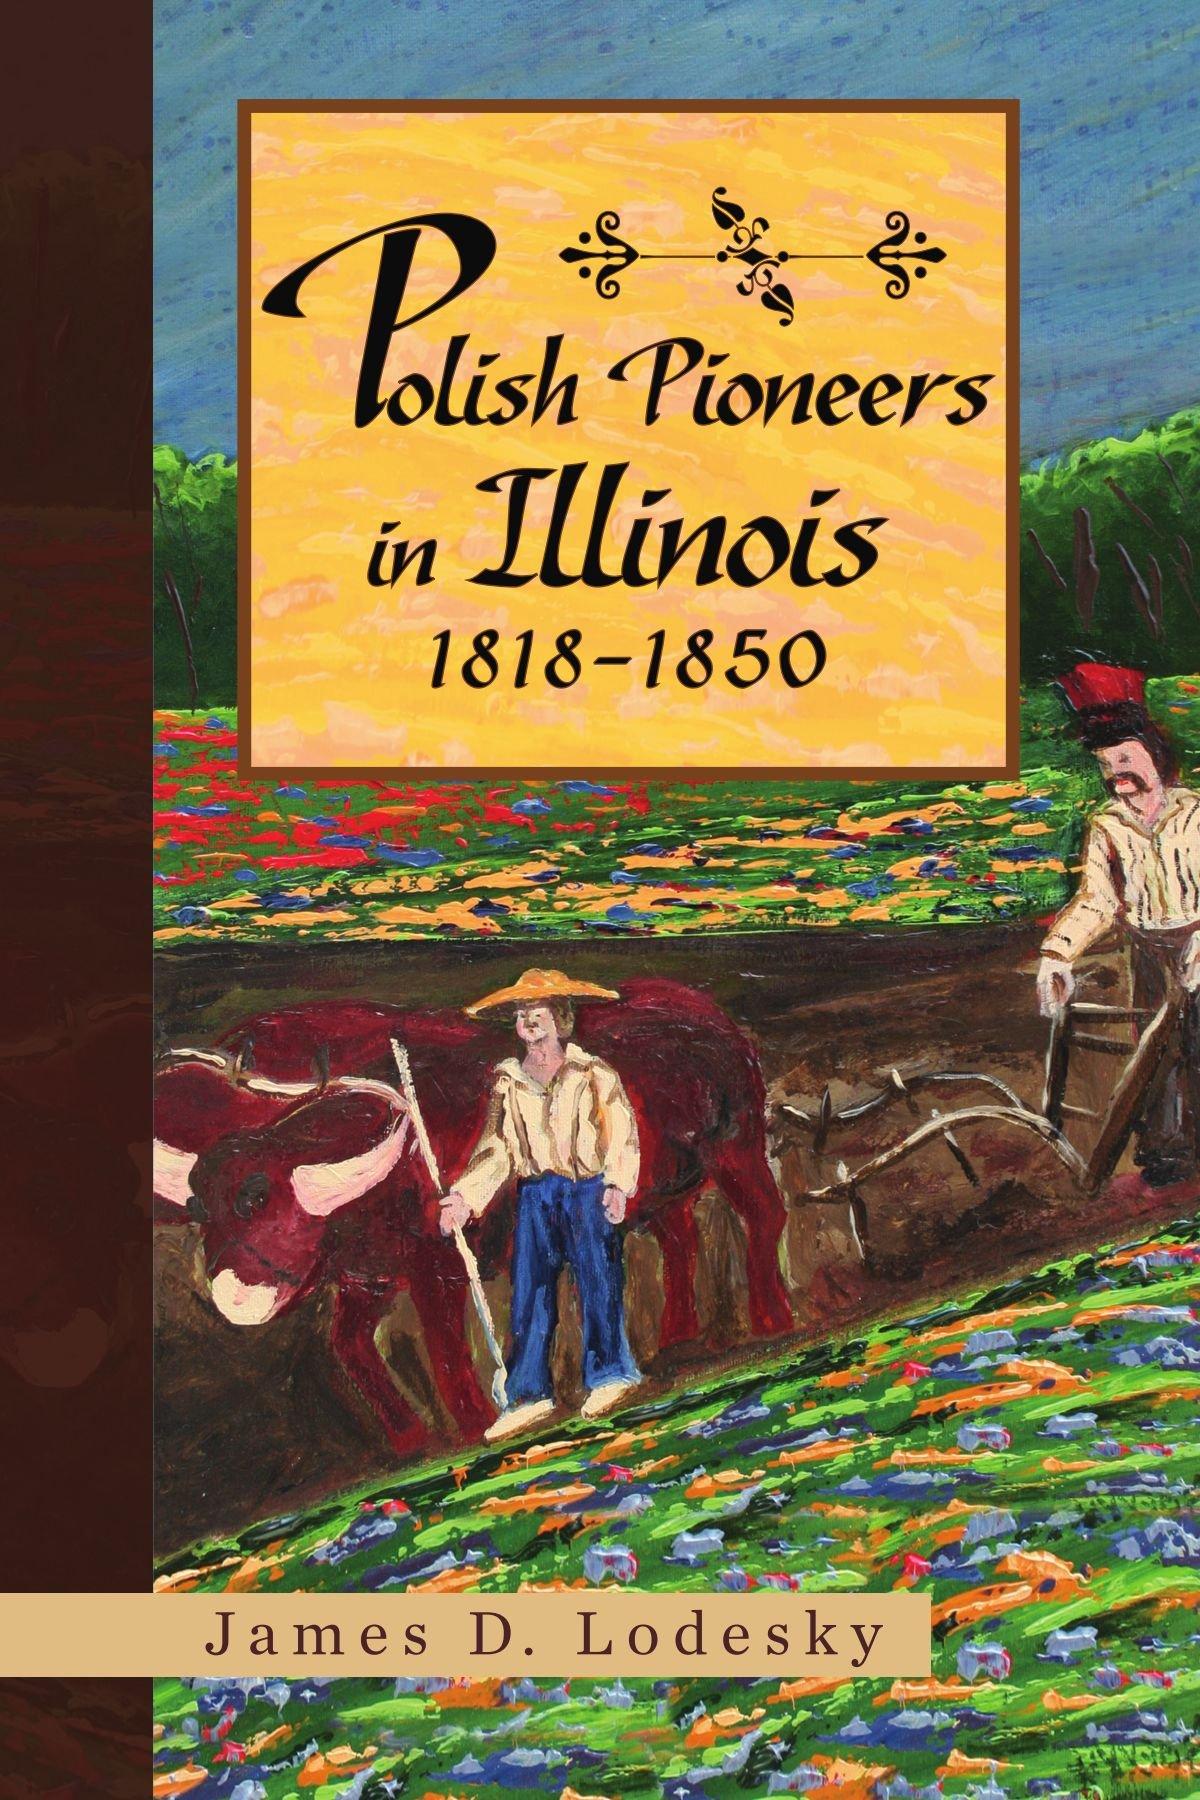 Polish Pioneers in Illinois 1818-1850